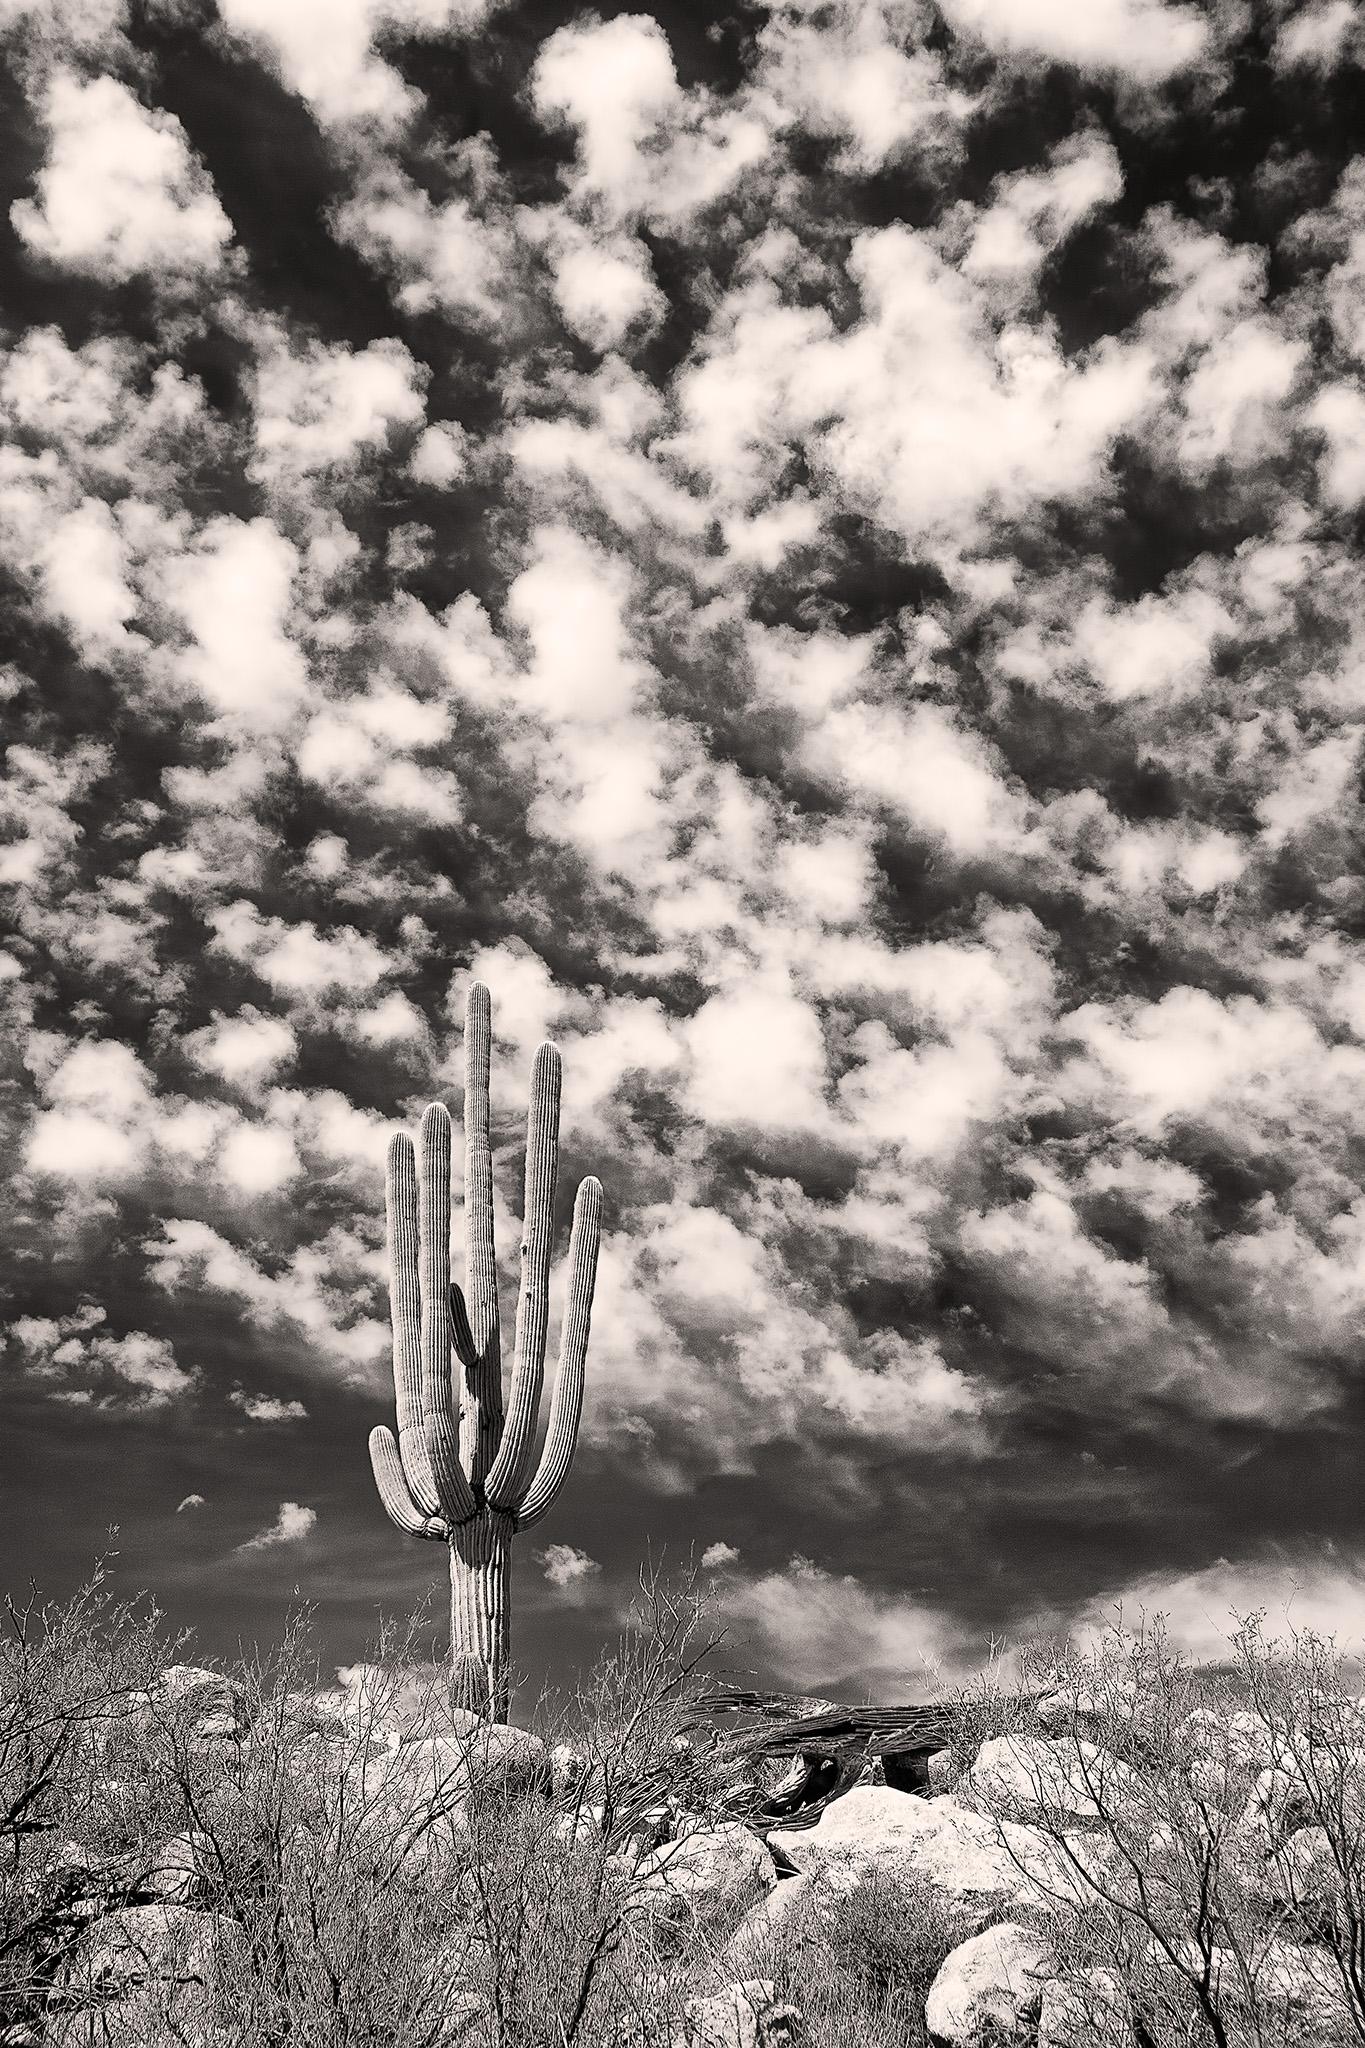 Lone Saguaro - Catalina State Park